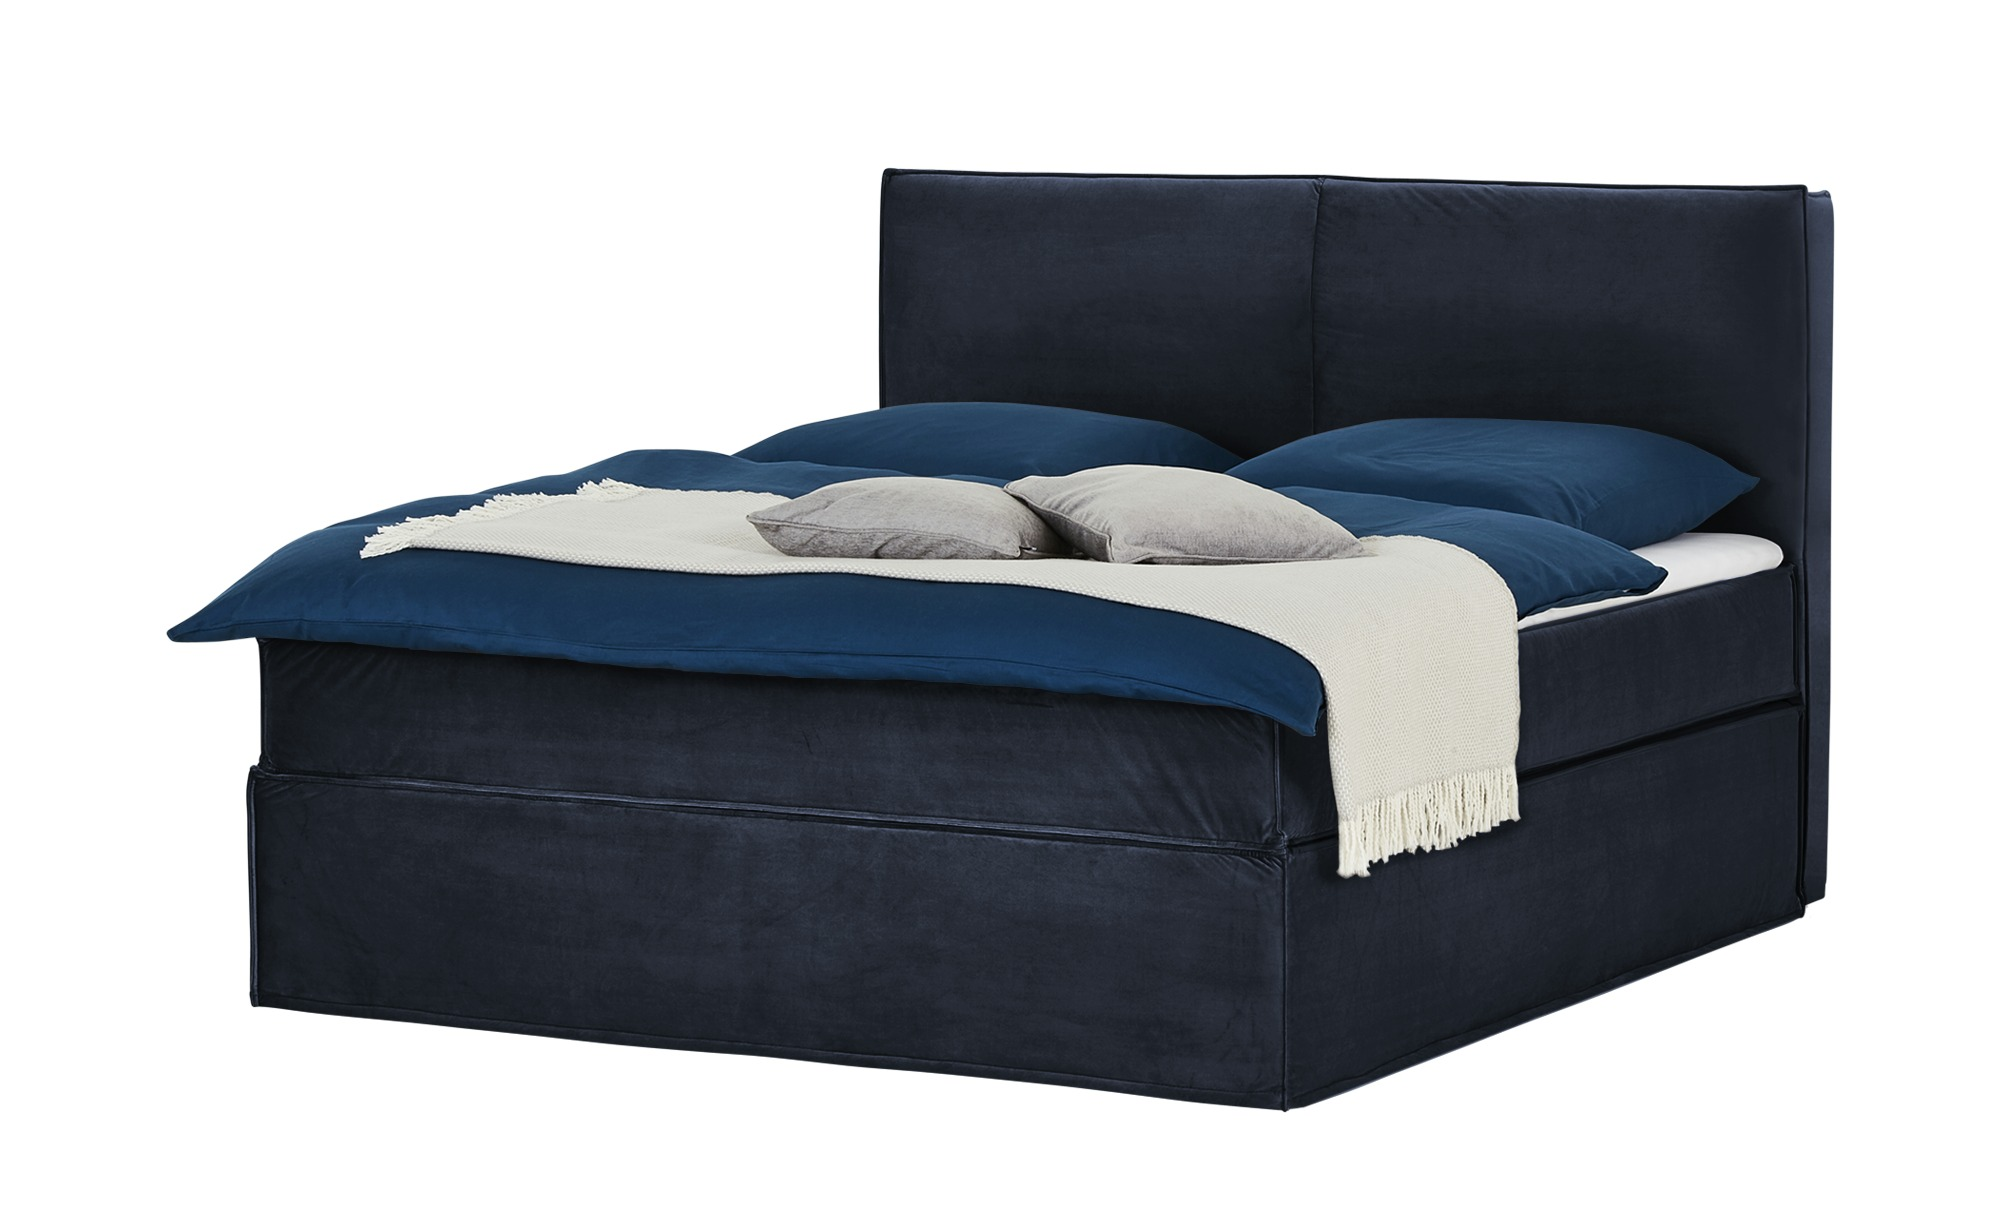 Boxspringbett 180 x 200 cm - blau - Betten > Boxspringbetten > Boxspringbet günstig online kaufen